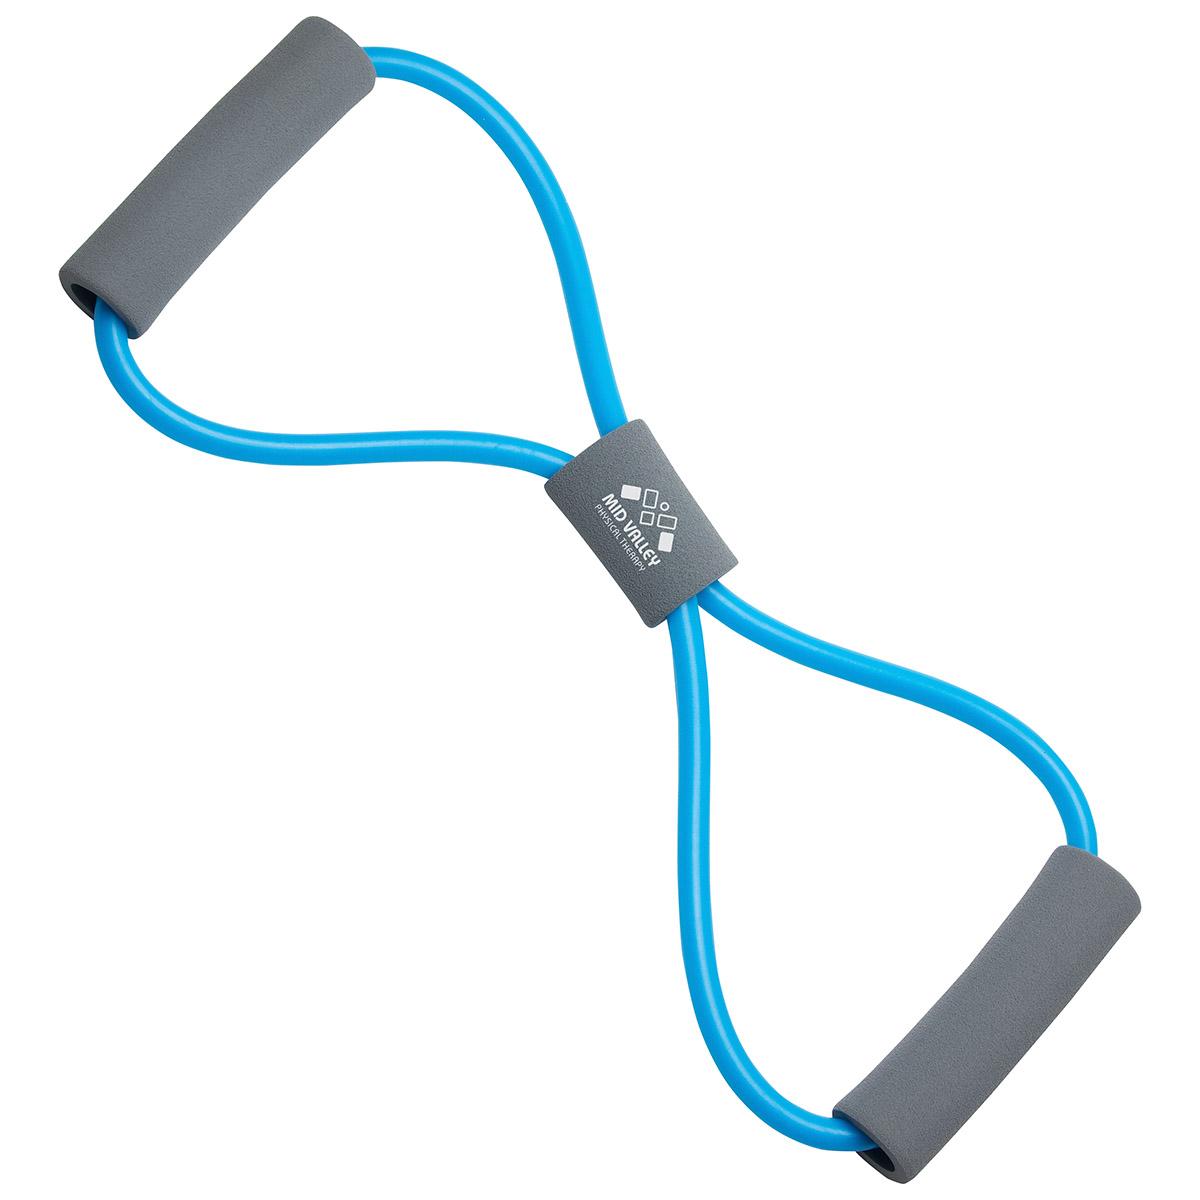 Fitness First Stretch Expander-Medium Resistance, WHF-MR15, 1 Colour Imprint